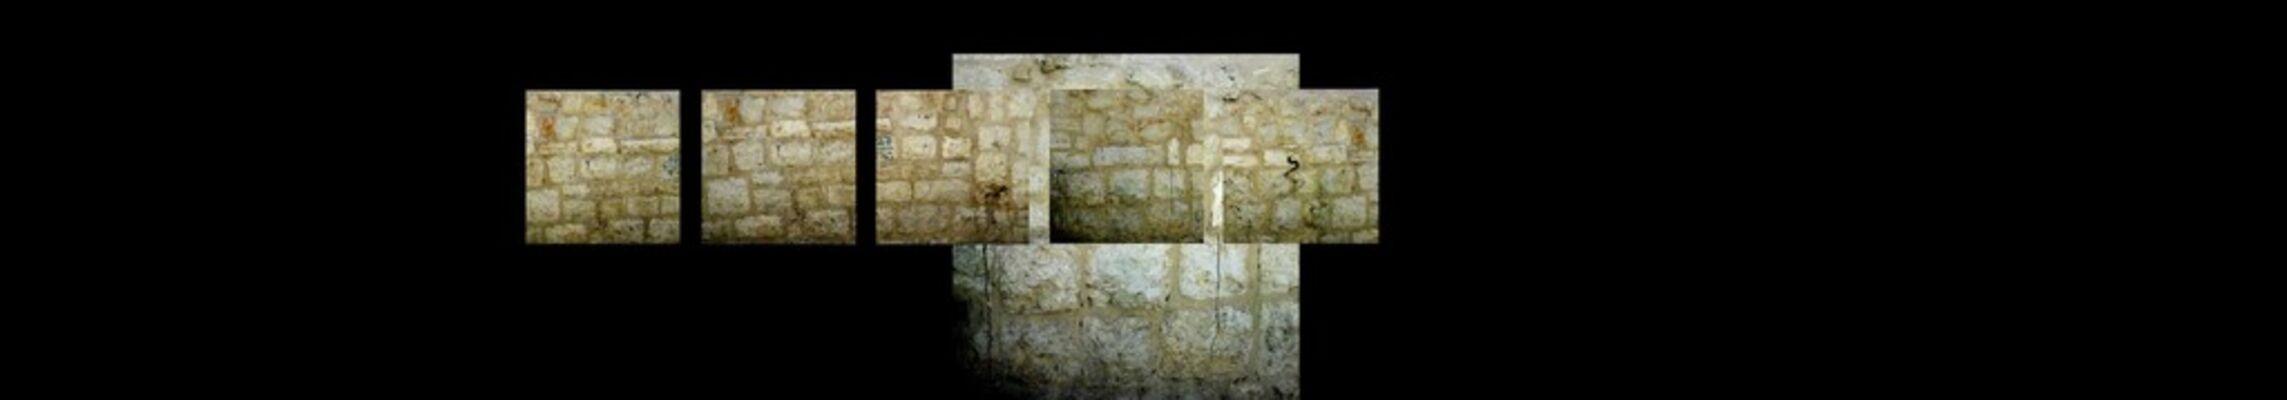 BETHLEHEM, installation view